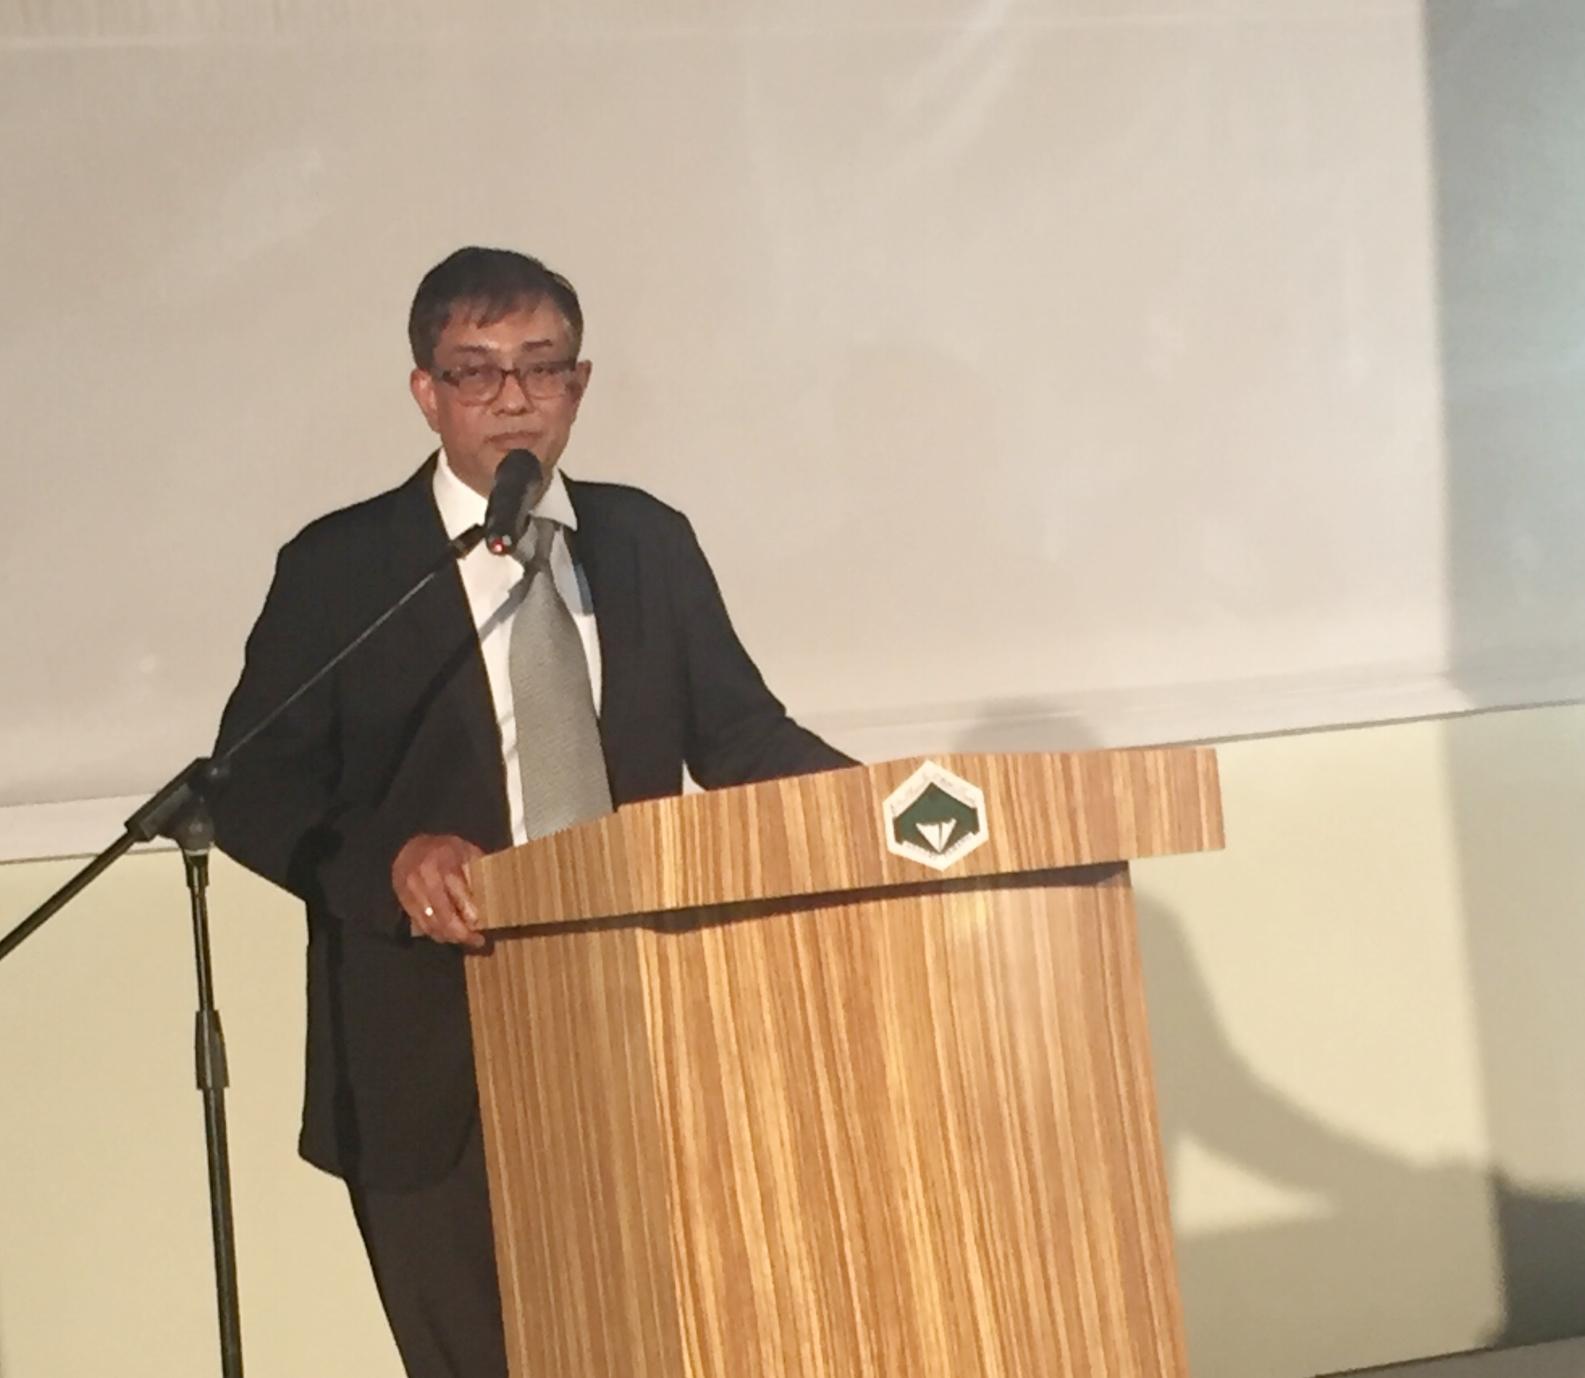 Dr. Vinesh Chandra, Senior Lecturer in Education,  Queensland University of Technology, Australia.